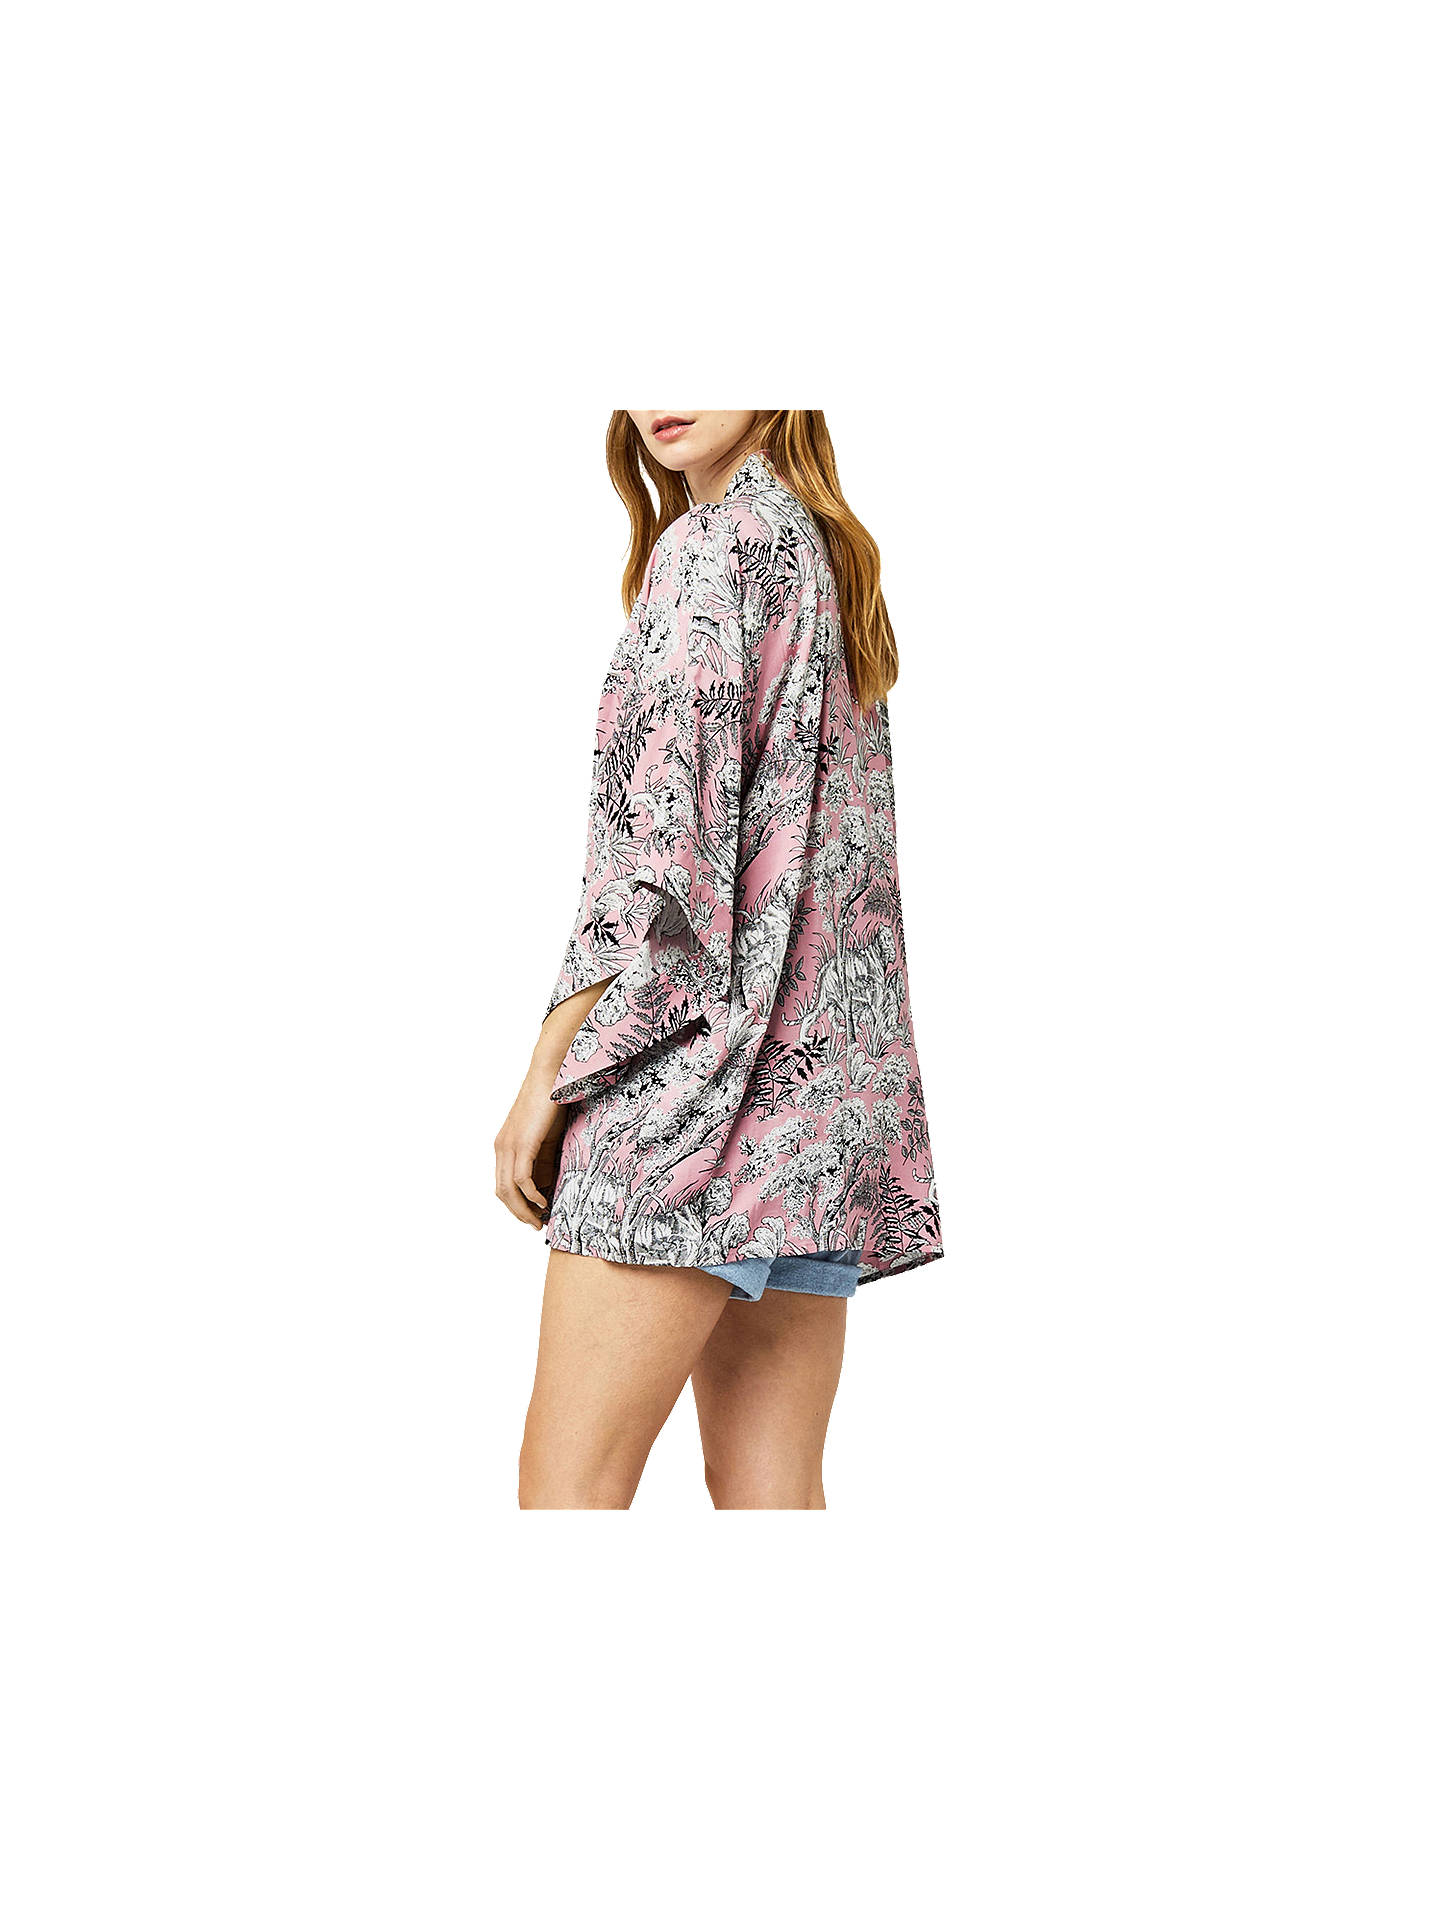 7a4bfb775 ... Buy Warehouse Tiger Printed Kimono, Light Pink, S-M Online at  johnlewis.com ...